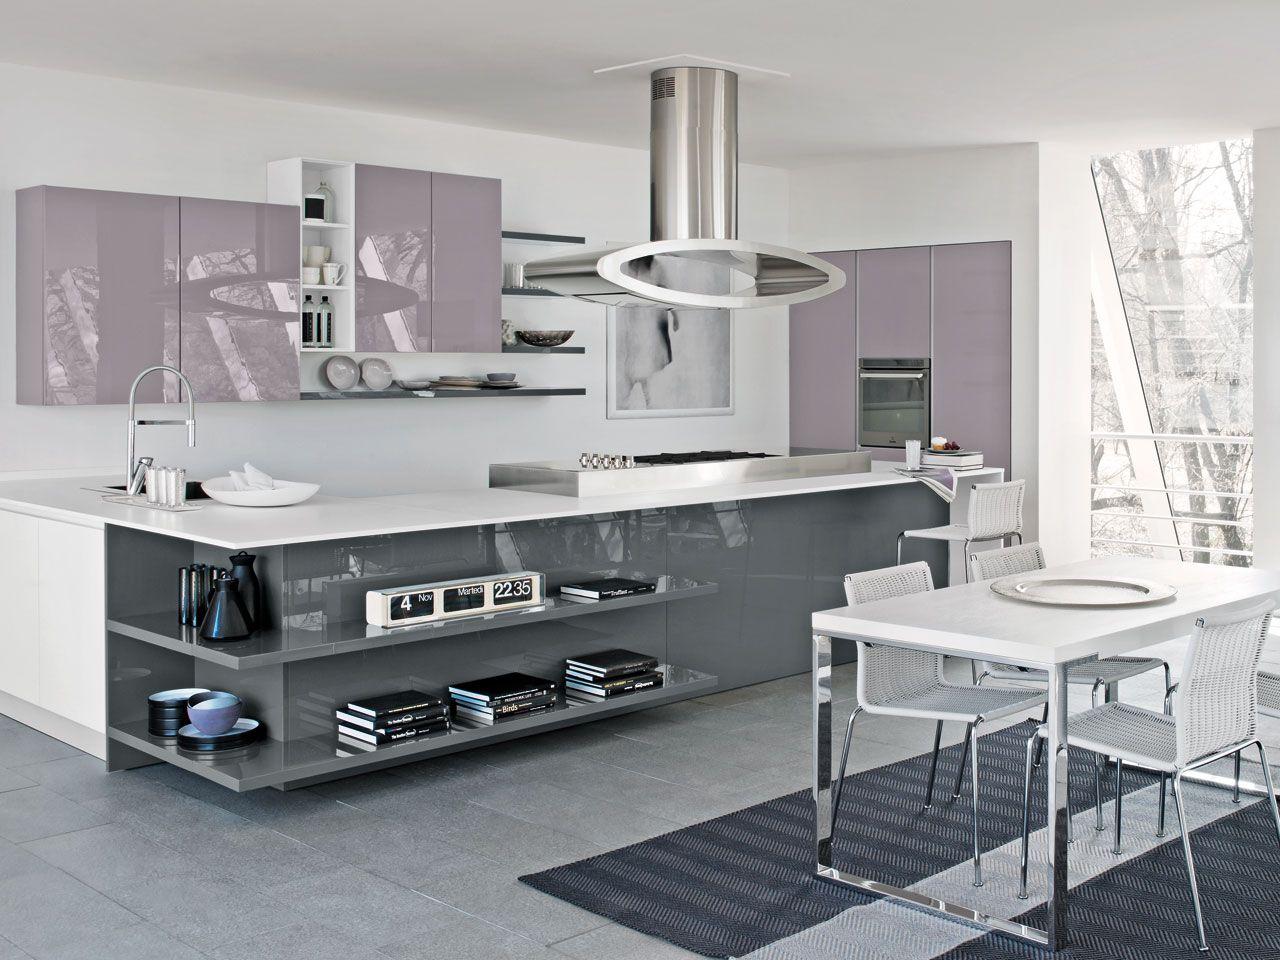 BRAVA - Cucina Lube Moderna | Cucine moderne, Design cucine ...